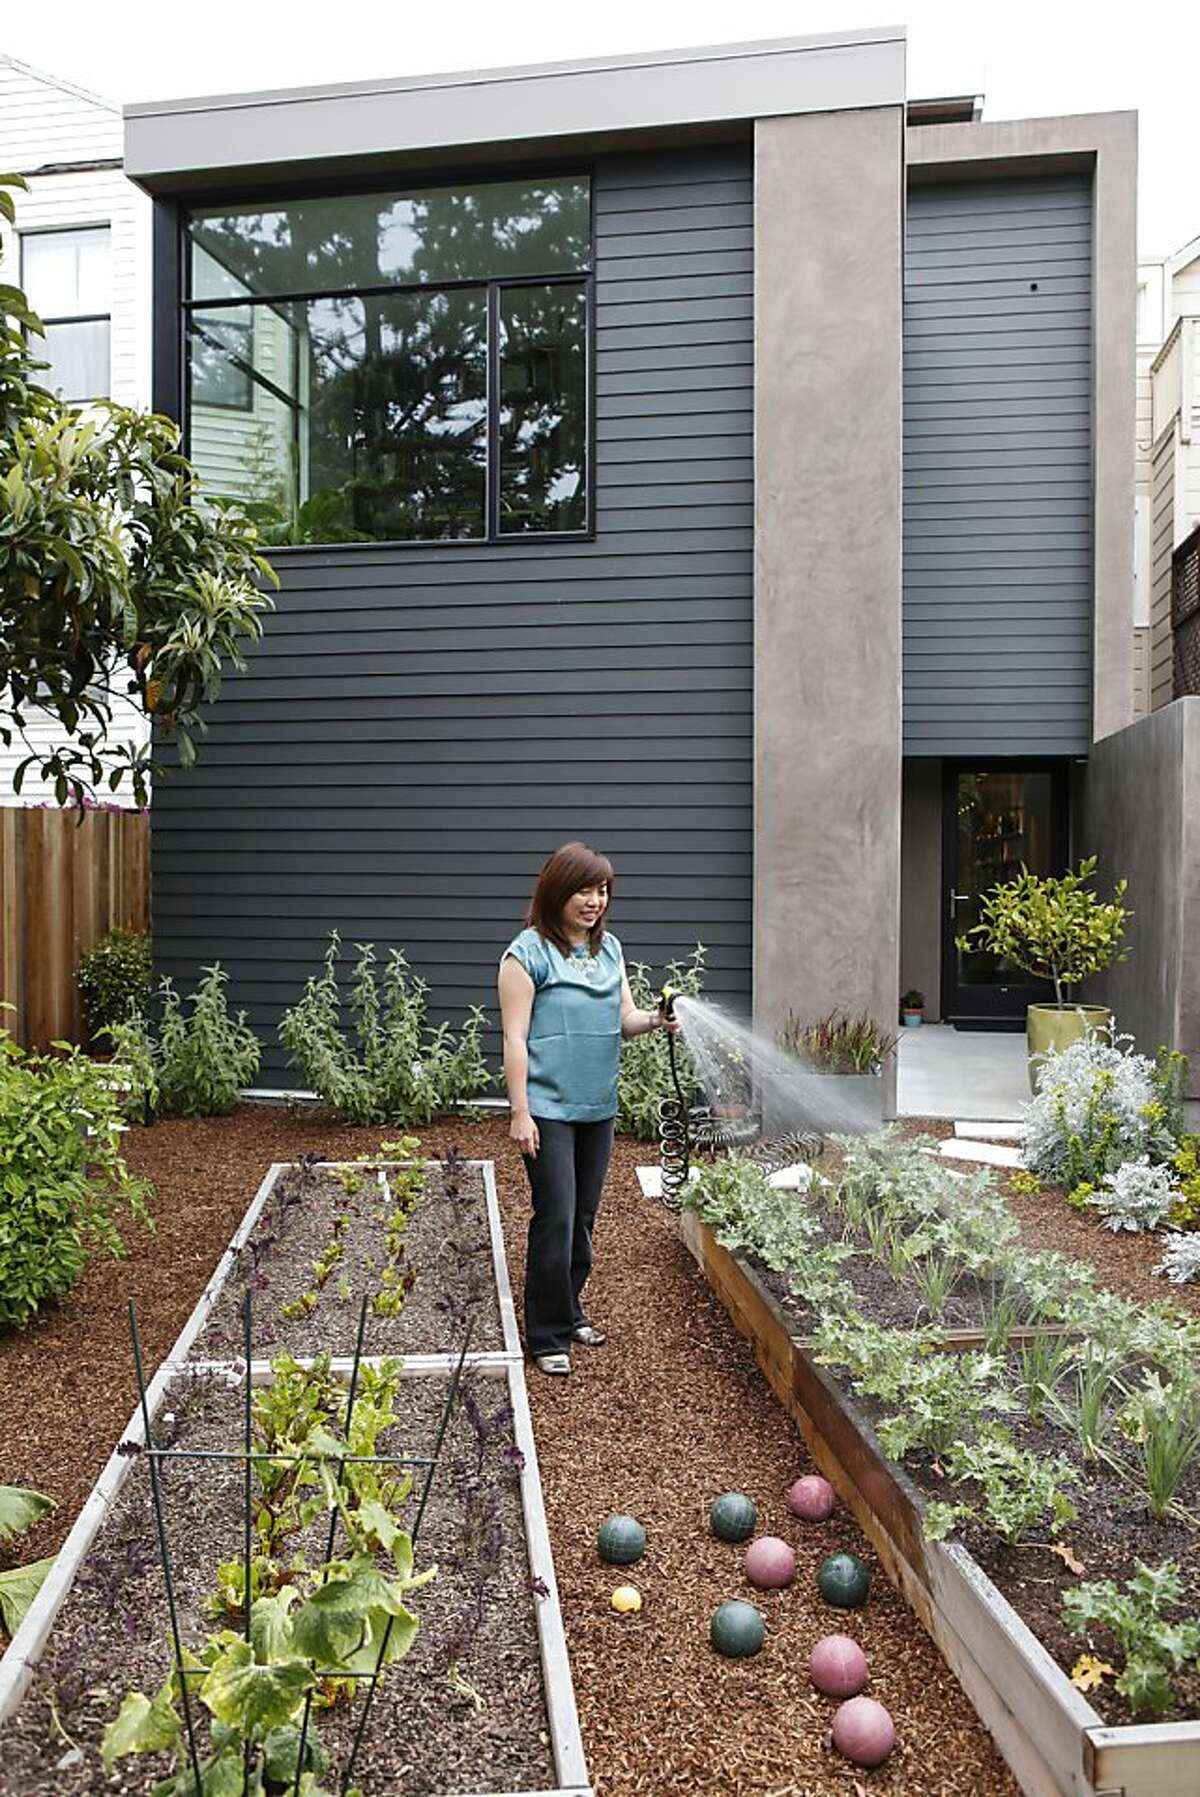 Mimi Chen's EDDIE house garden is seen on Friday, Aug. 31, 2012 in San Francisco, Calif.